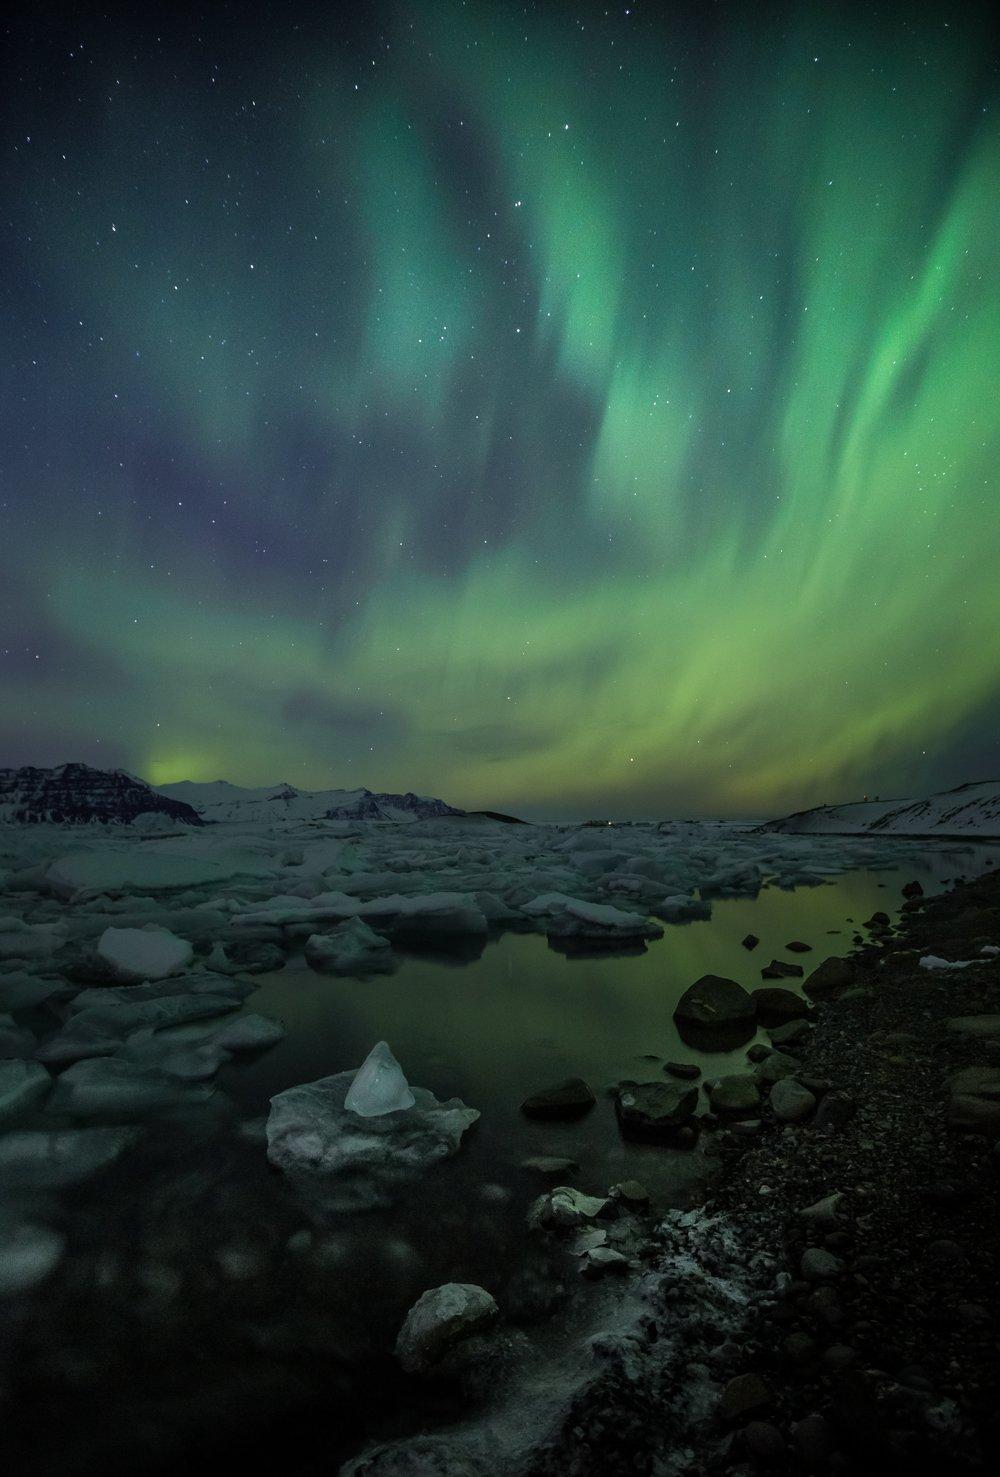 северное сияние, исландия ,голубая лагуна, лед, отражение , аврора, Ирина Назарова